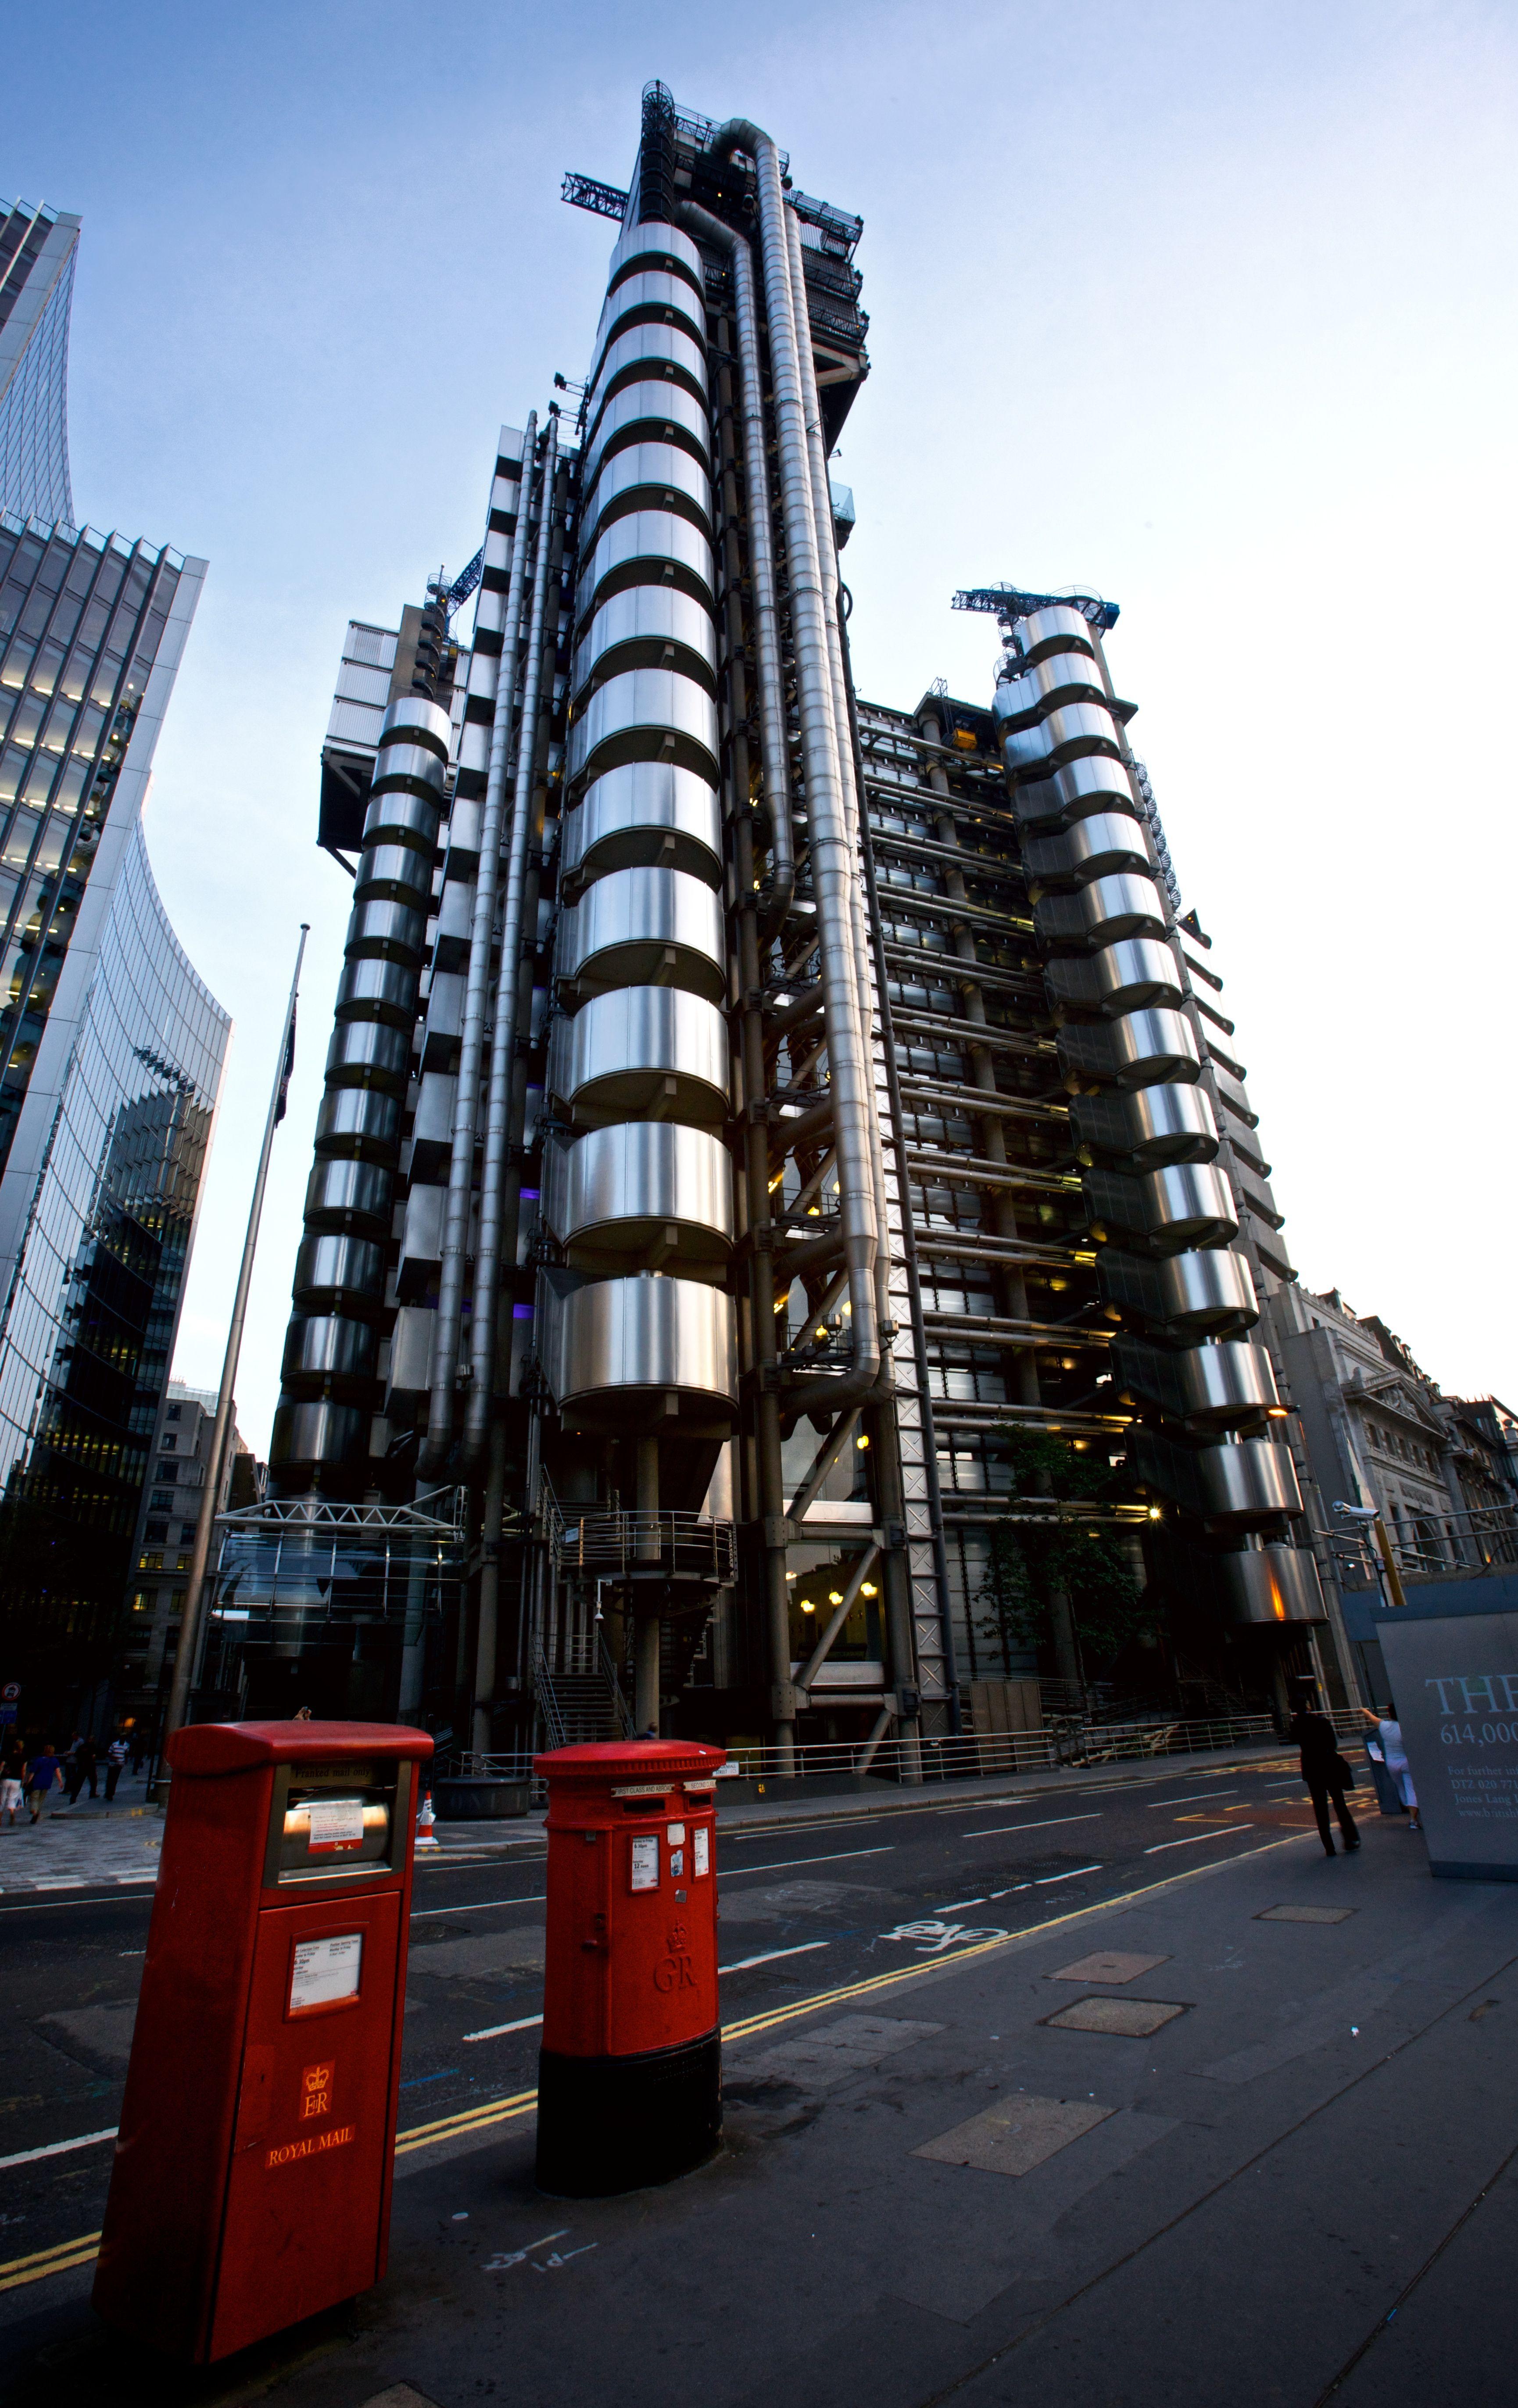 Rogers Lloyd's_building_from_Leadenhall_Street Famous